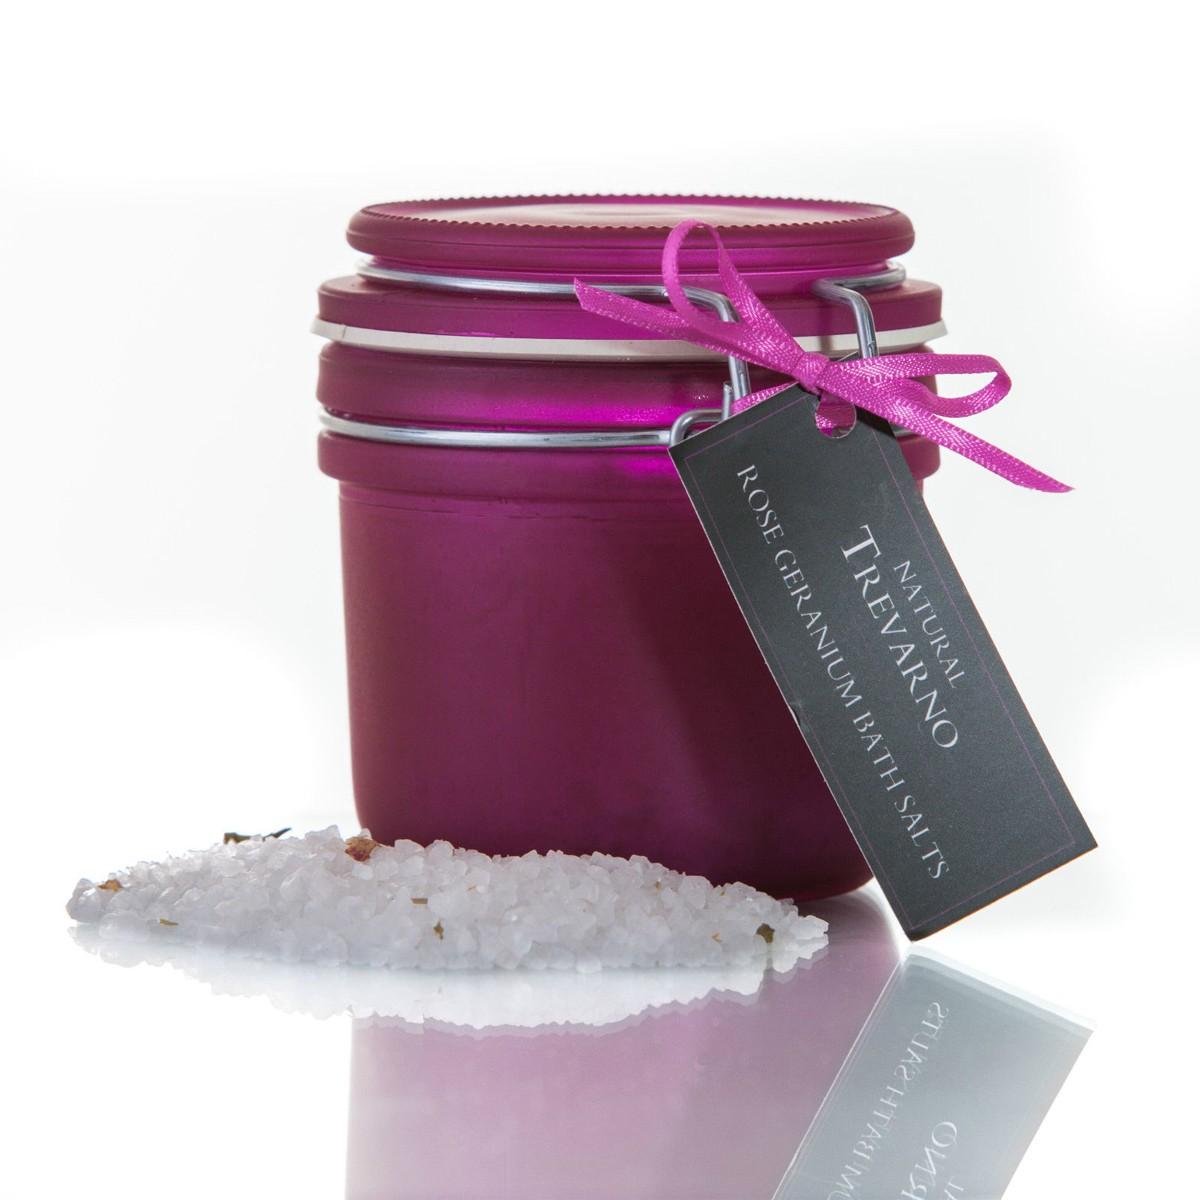 Organic Trevarno, Indulgent Rose Geranium Bath Salts